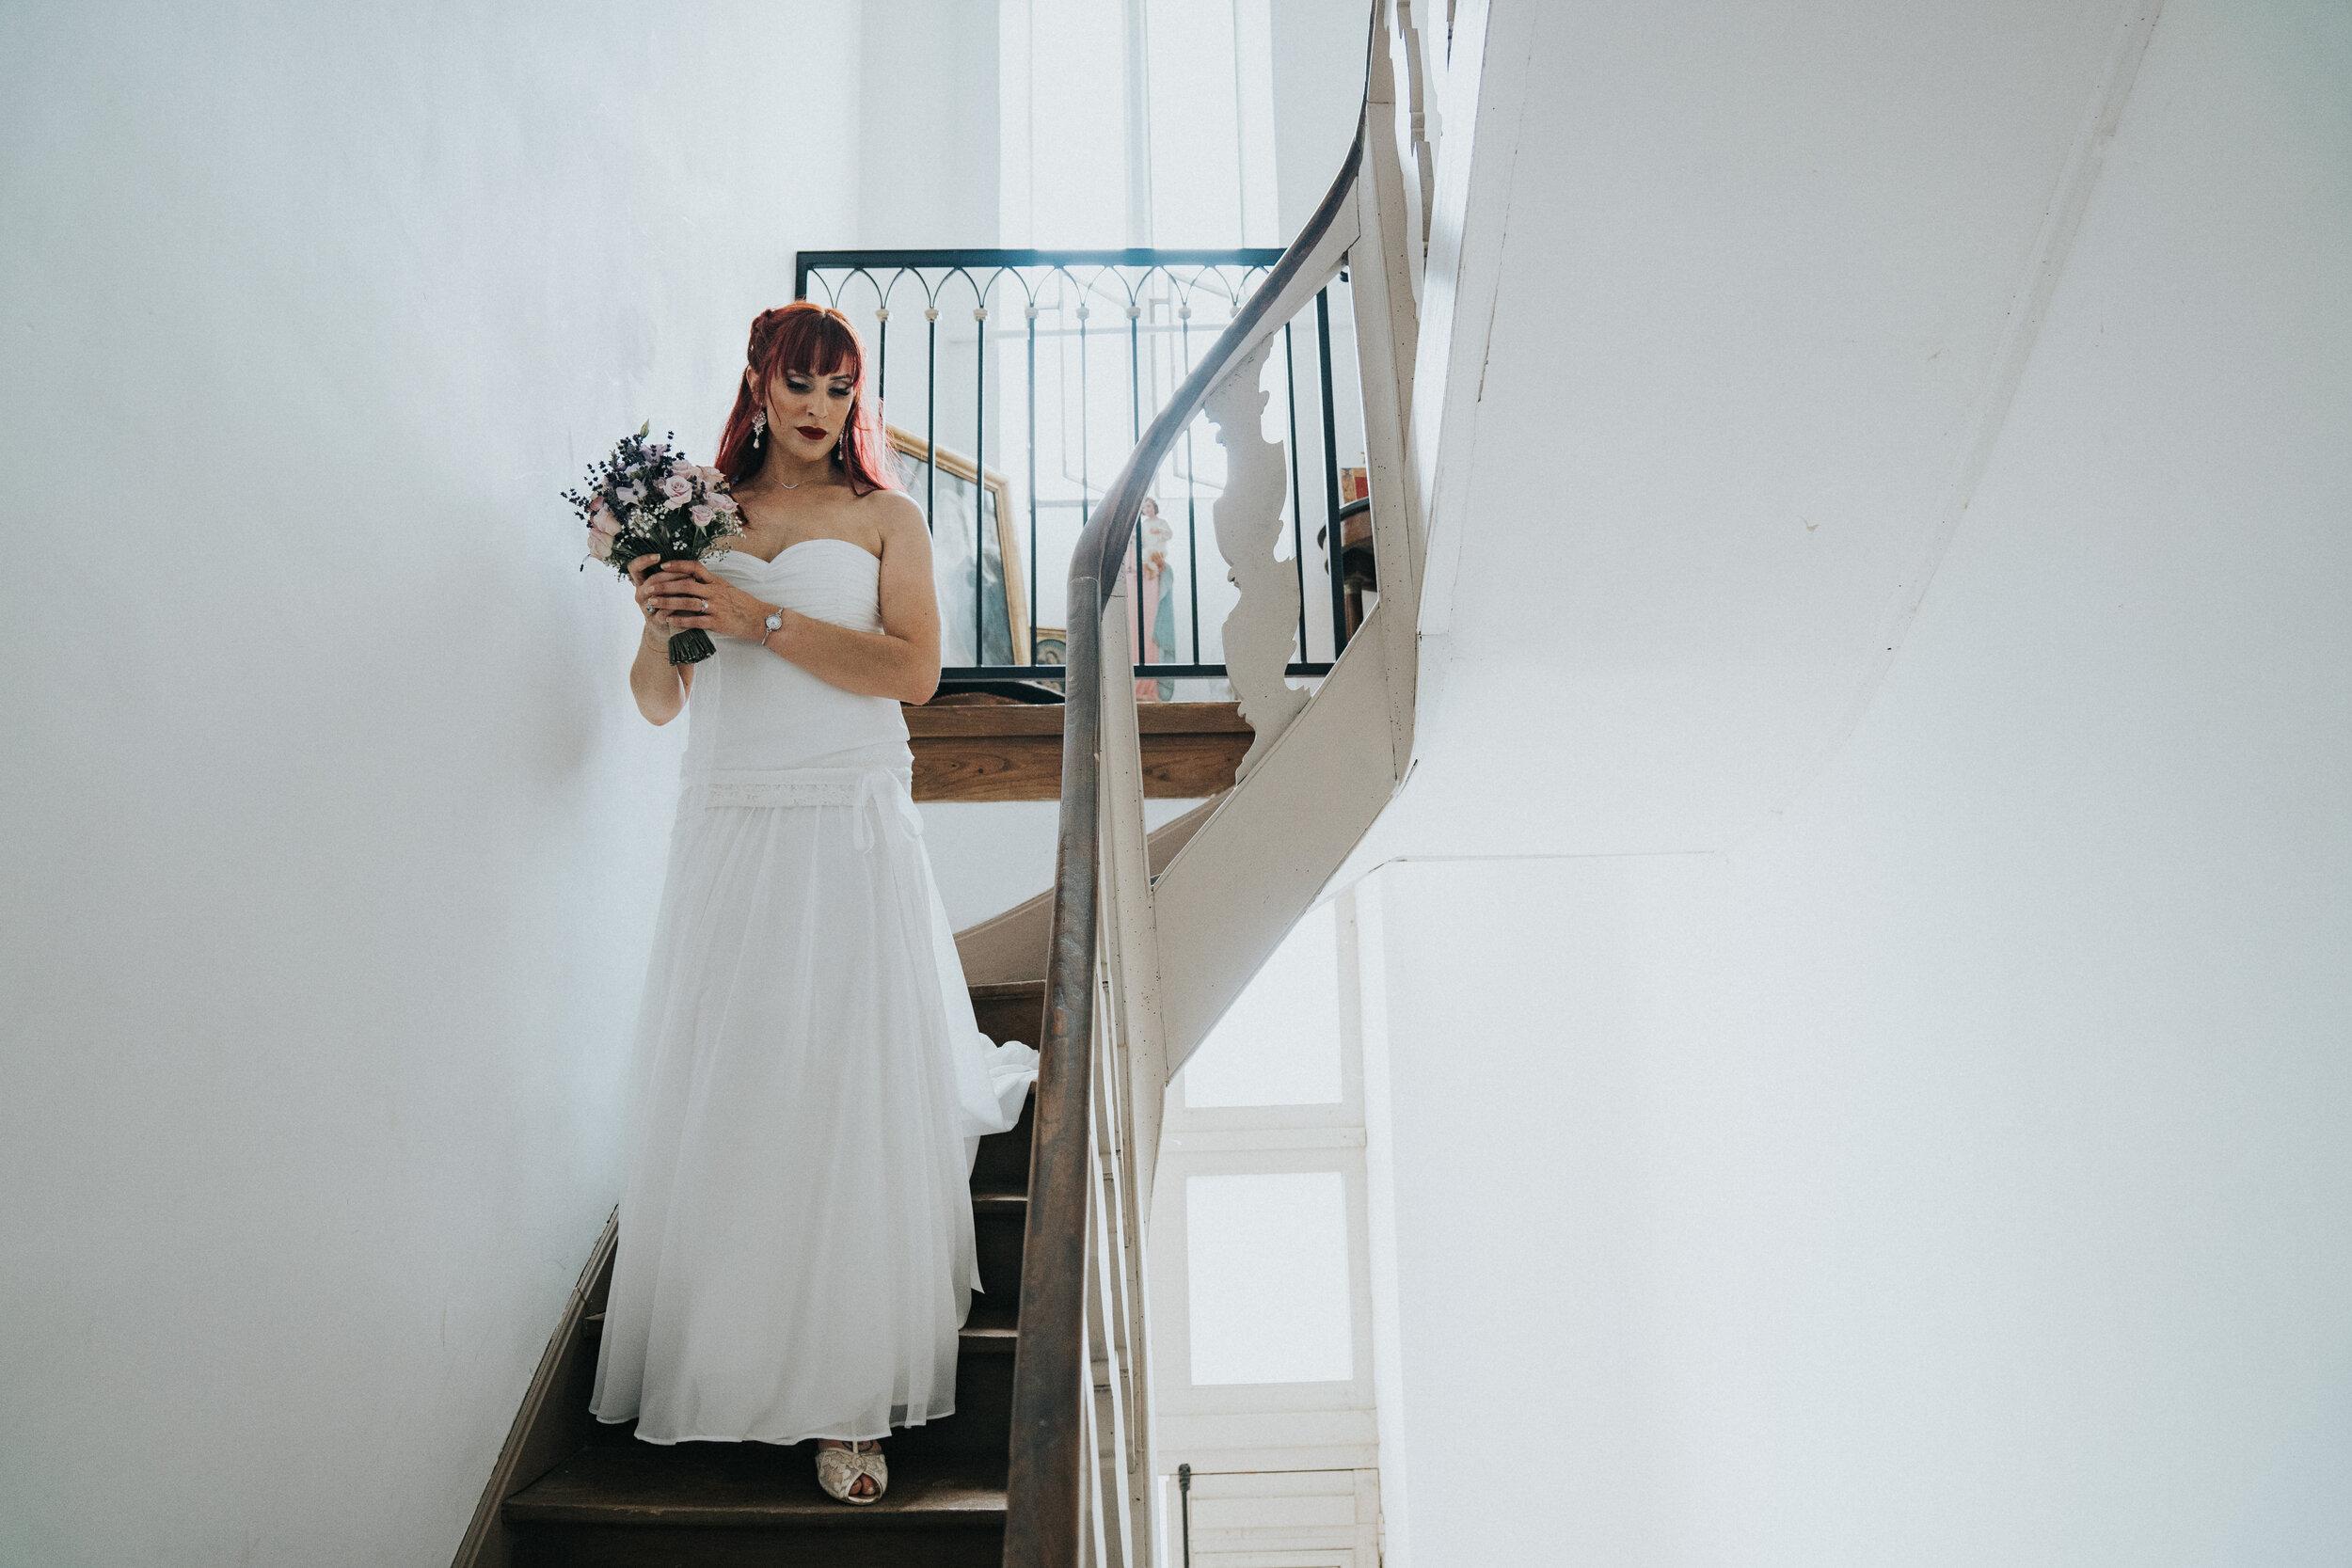 bride-prep-france-carcassonne-london-wedding-photographer-08